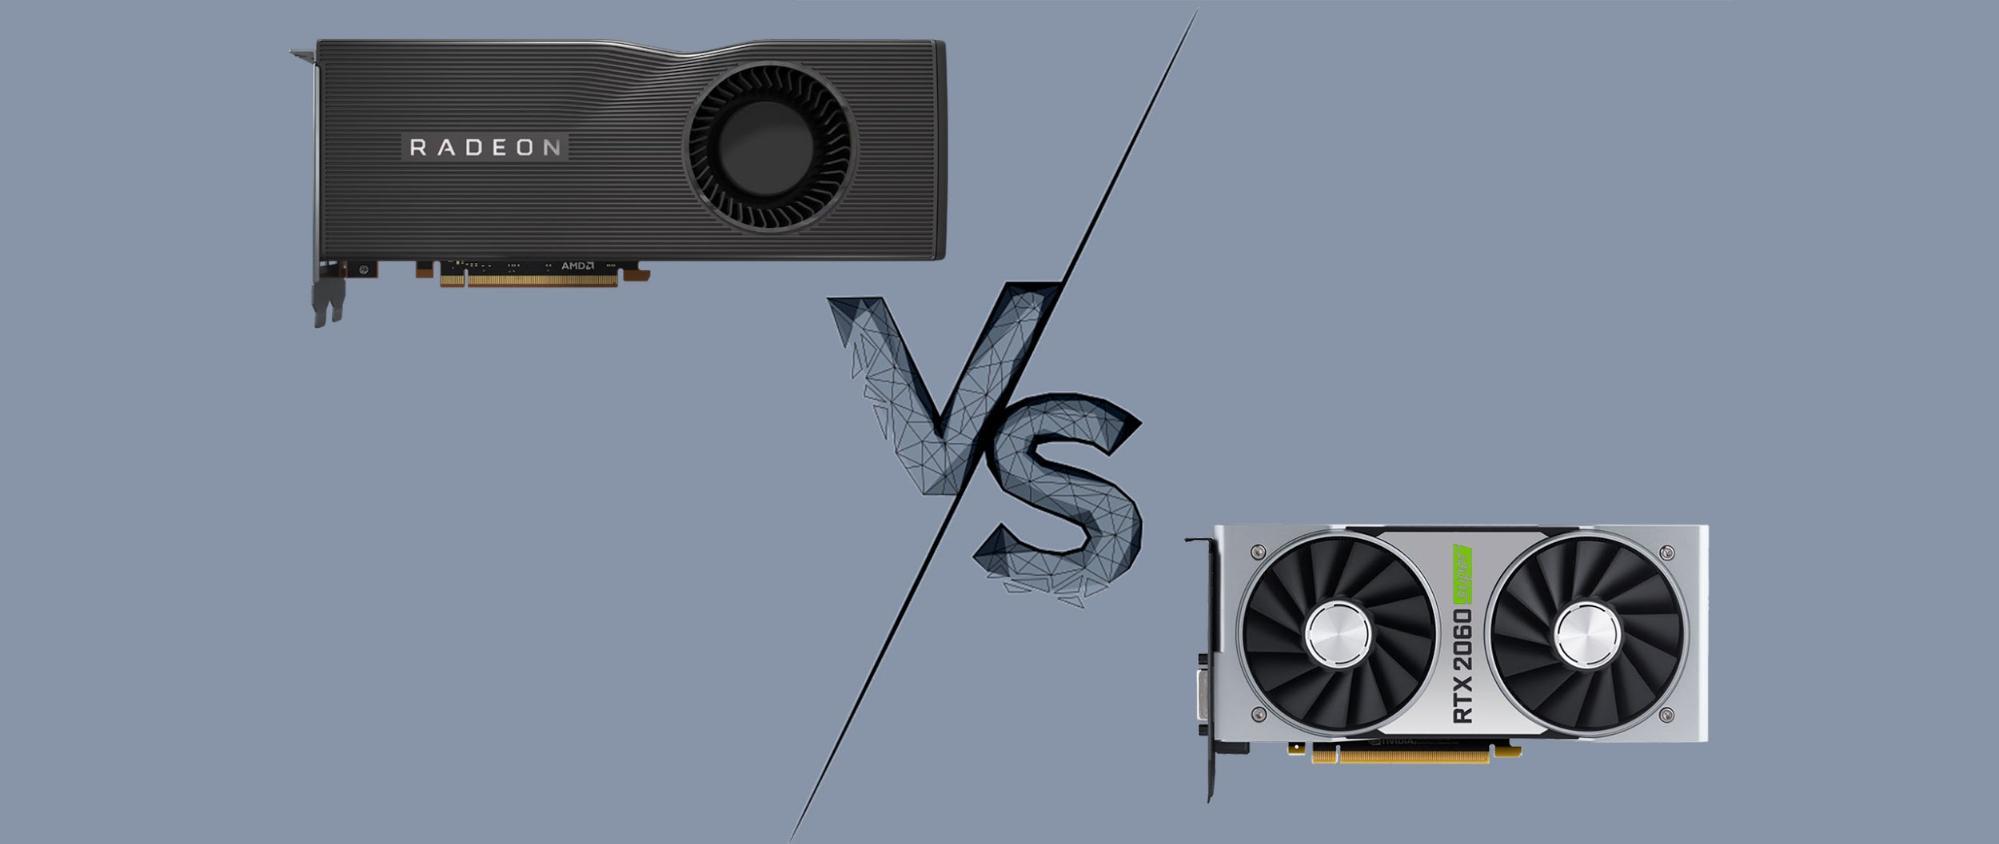 Amd Radeon Rx 5700 Xt Vs Nvidia Geforce Rtx 2060 Super 400 Gpu Throwdown Tom S Hardware